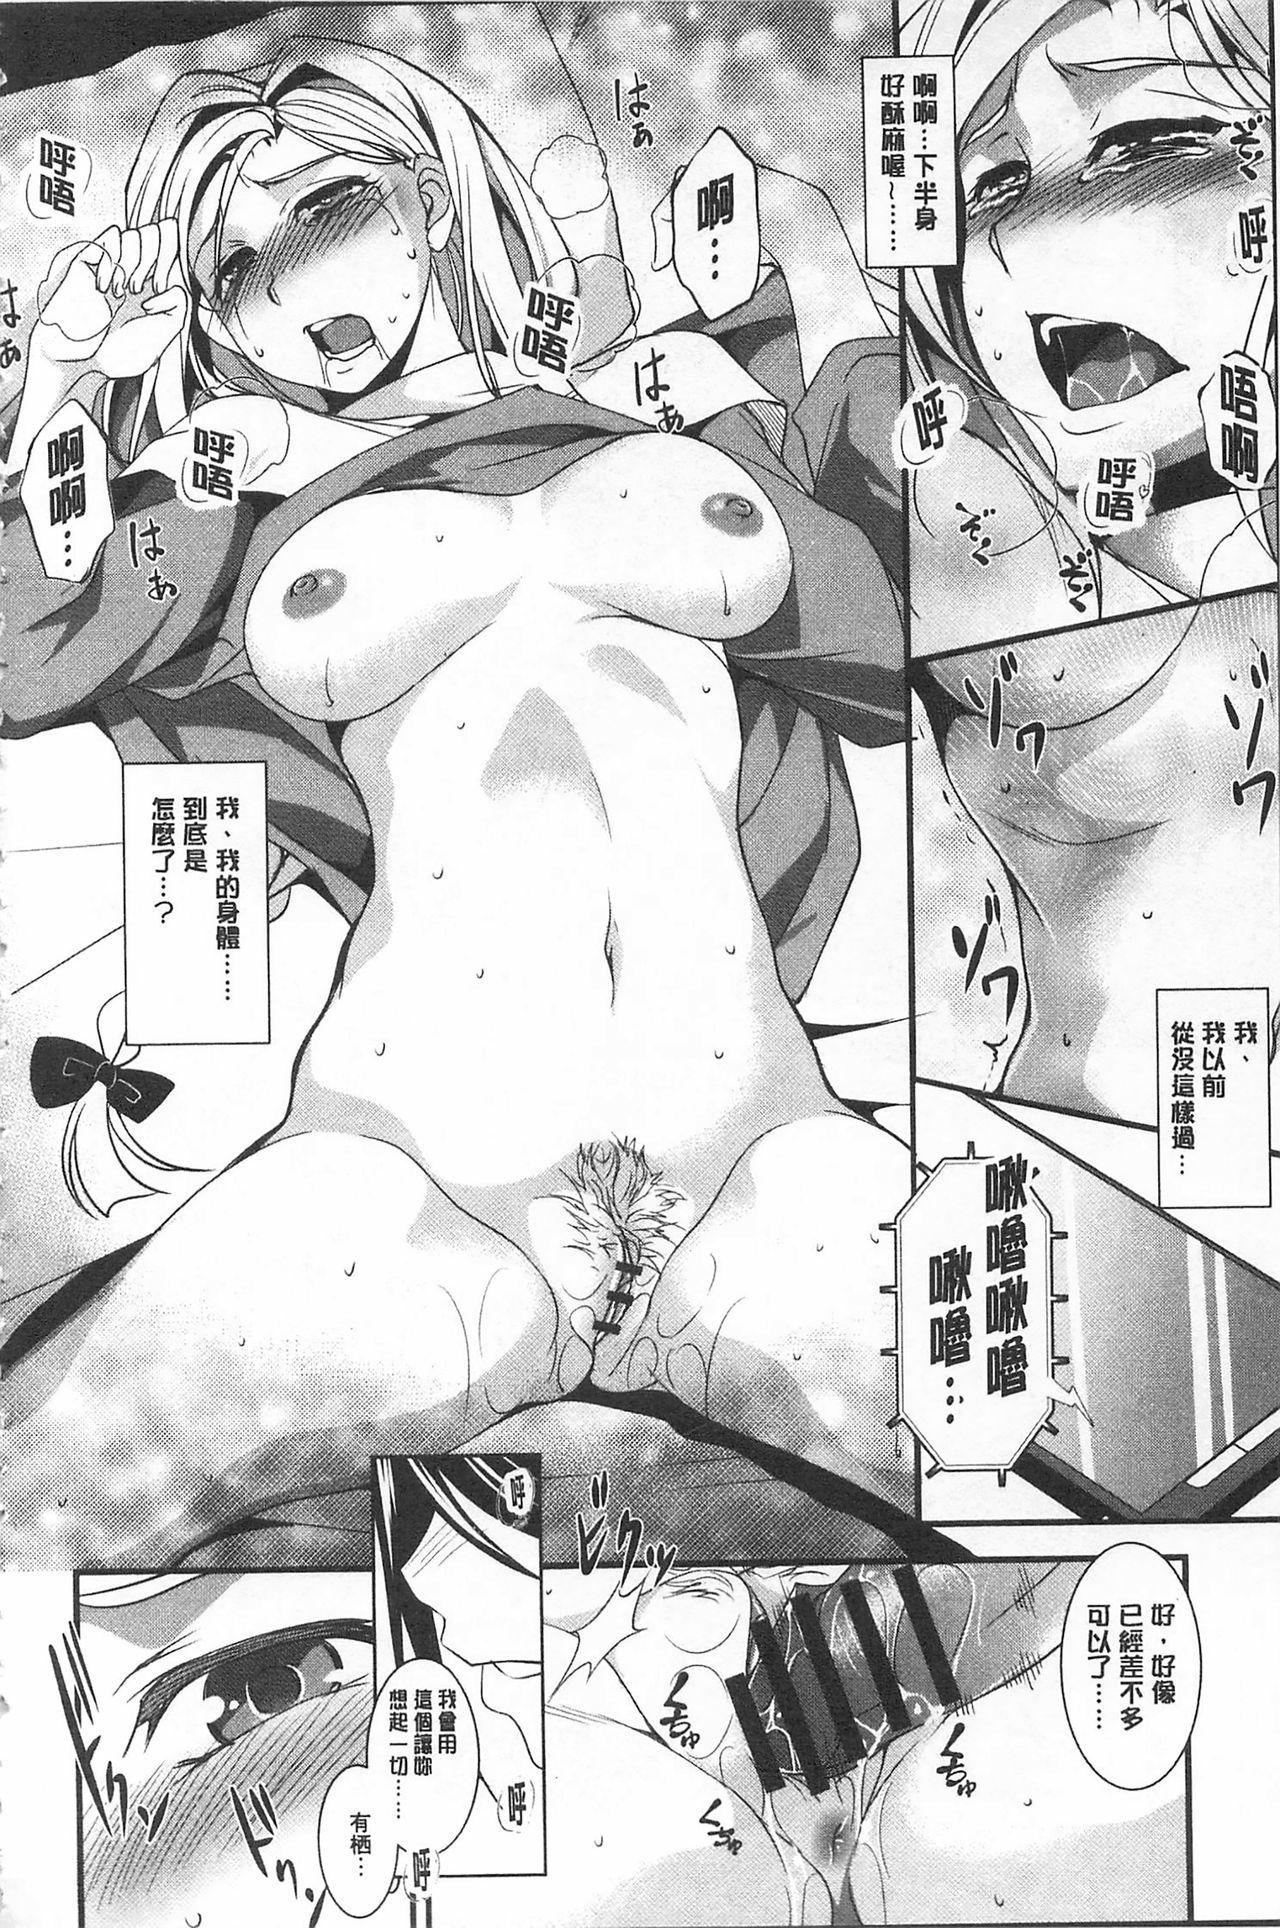 [Amano Kazumi] Seida Inyou -Seijo no Katachi Shita Intou- | 聖墮陰陽 -聖女的容貌與淫蕩- [Chinese] 41